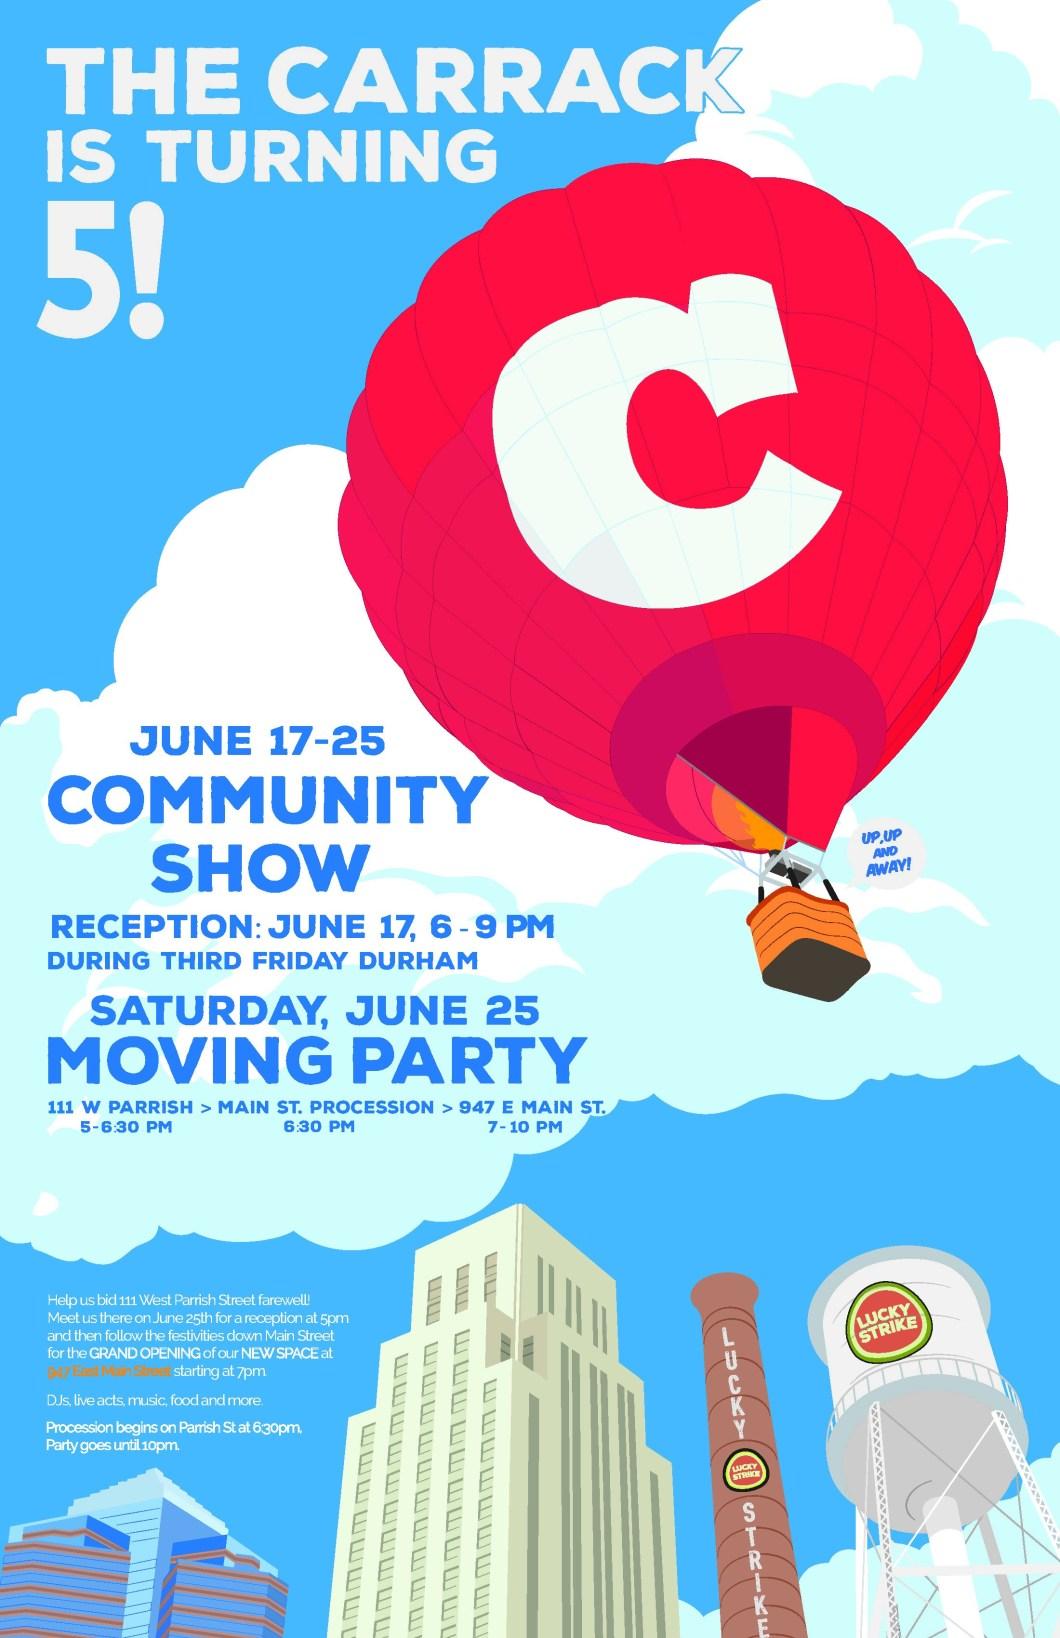 carrack-5th-birthday-community-show_final